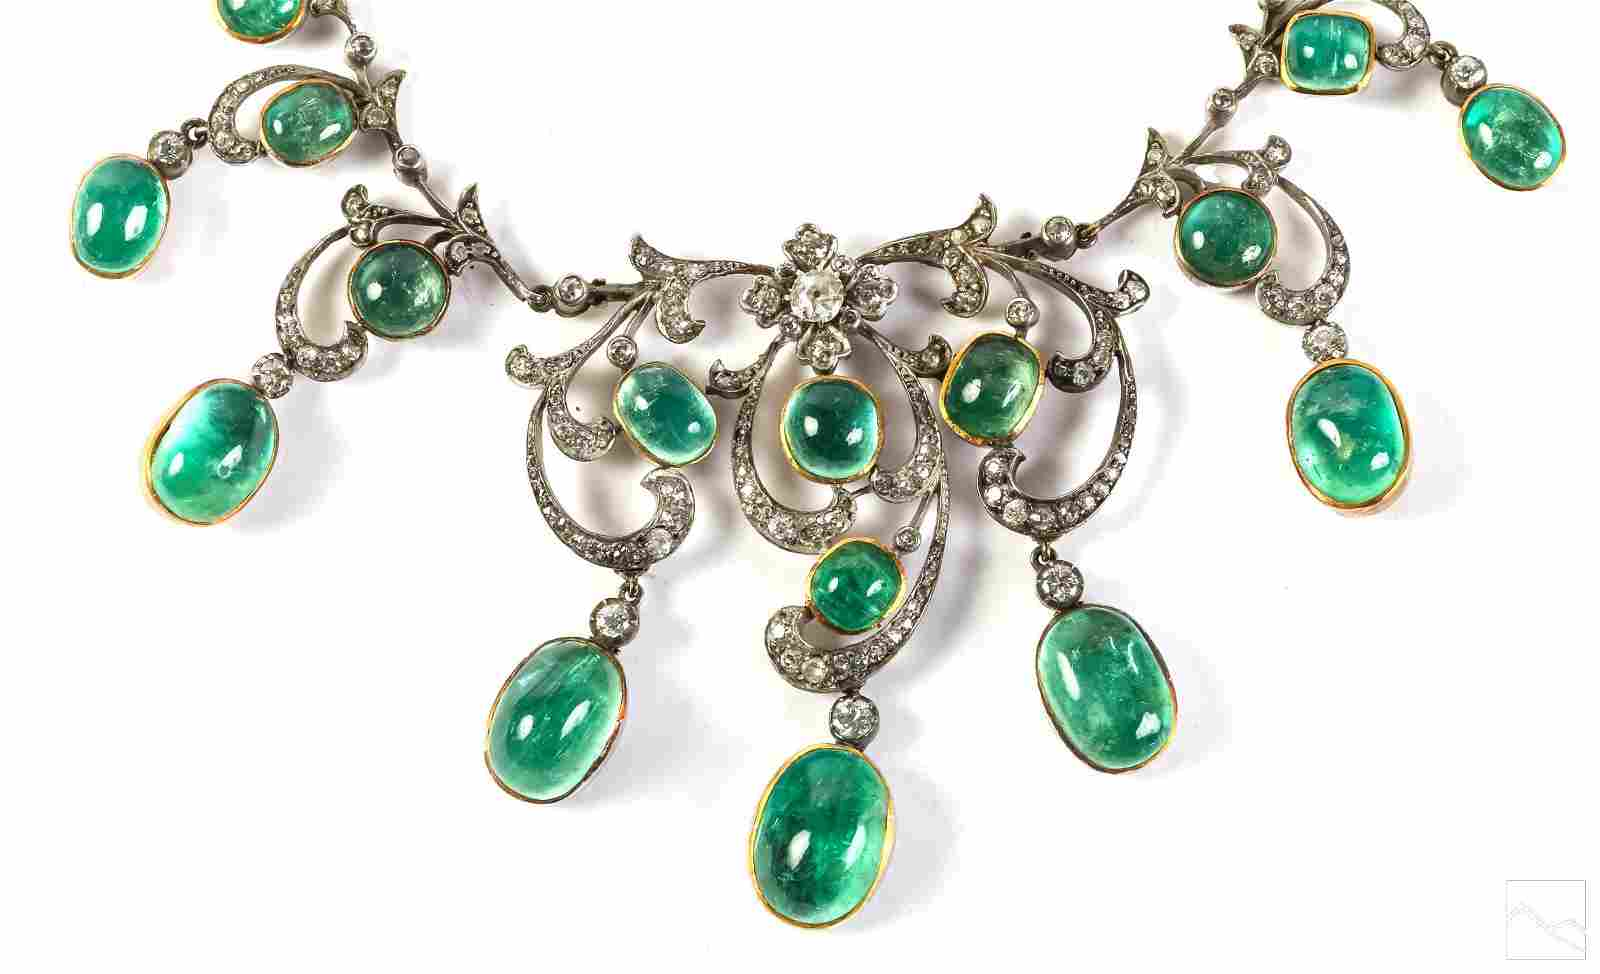 Victorian 100 Carat Emerald Diamond Necklace Tiara